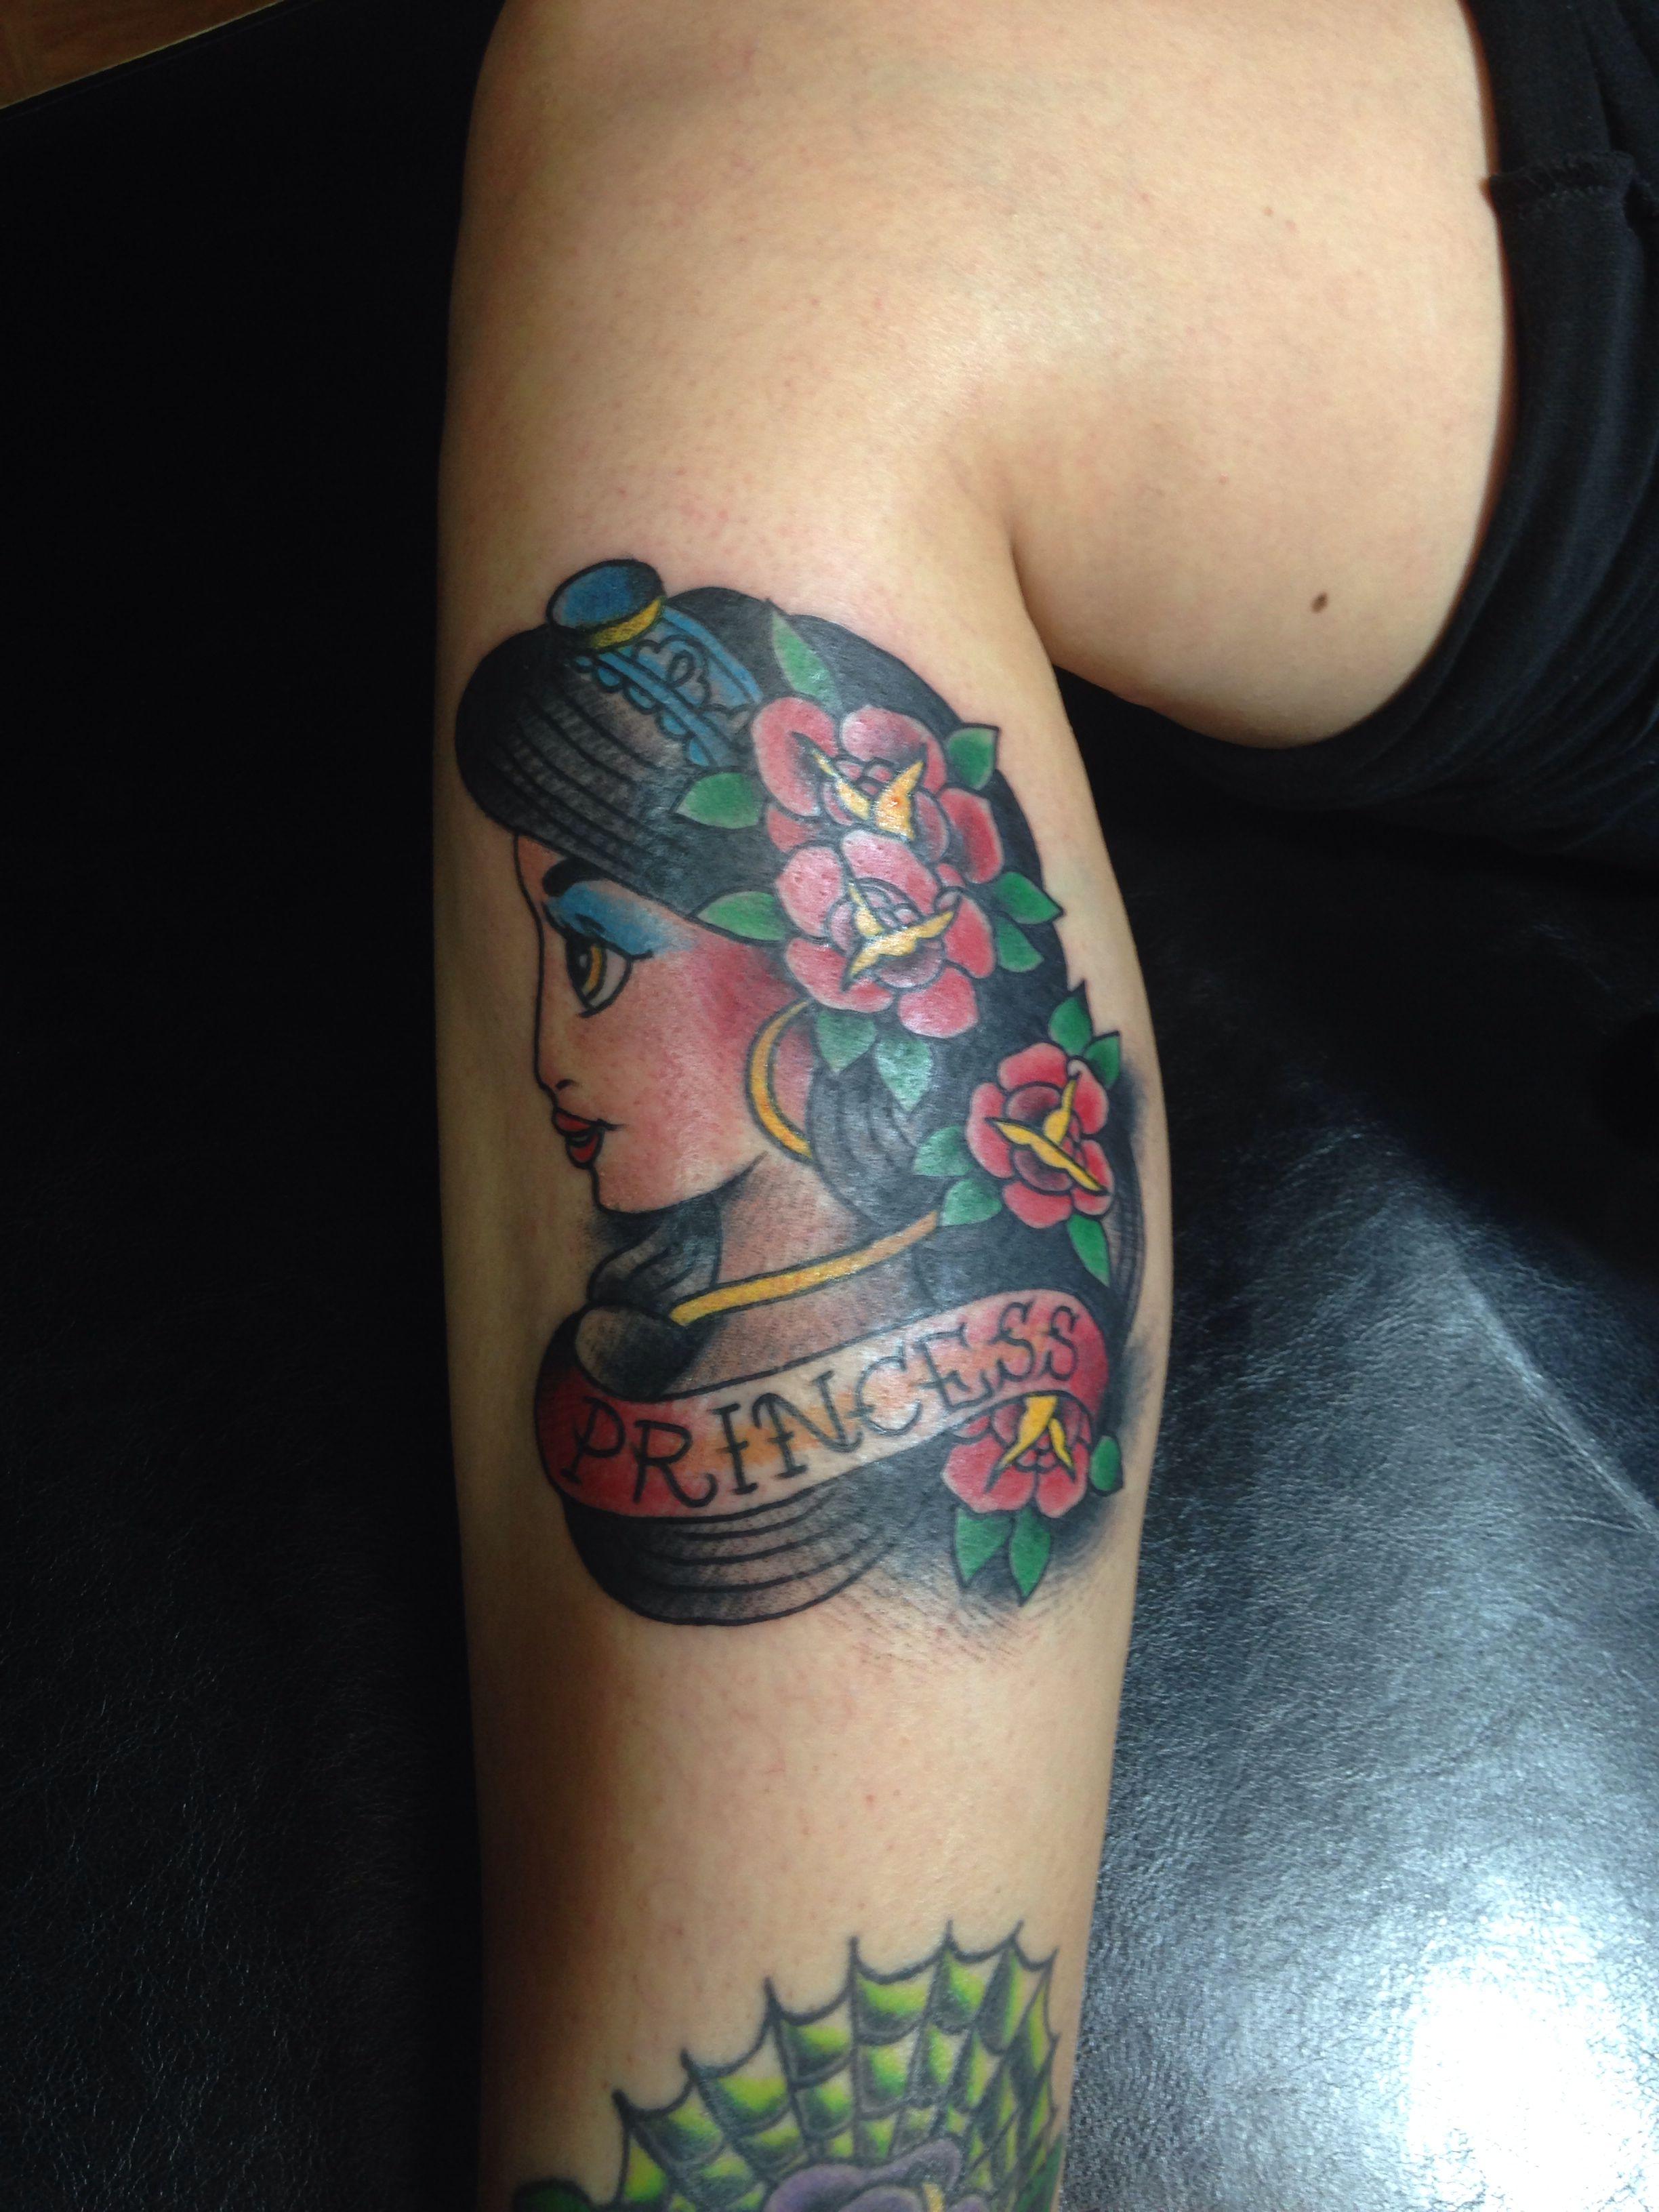 Disney princess jasmine traditional tattoo tattoos pinterest disney princess jasmine traditional tattoo izmirmasajfo Images